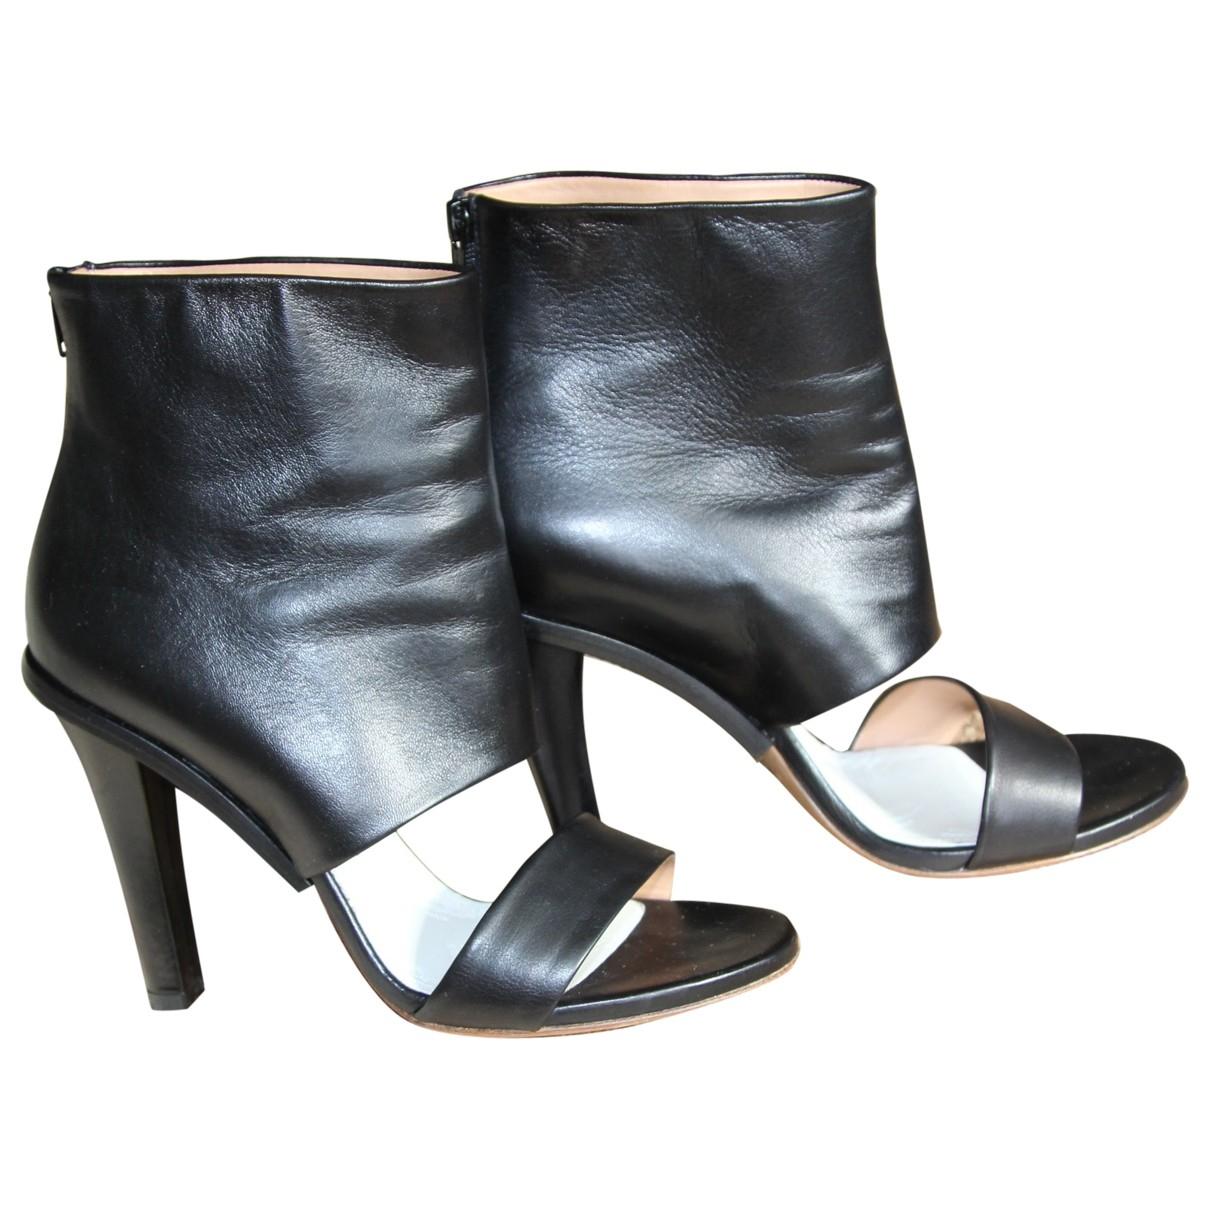 Maison Martin Margiela \N Black Leather High Heel for Women 37 EU